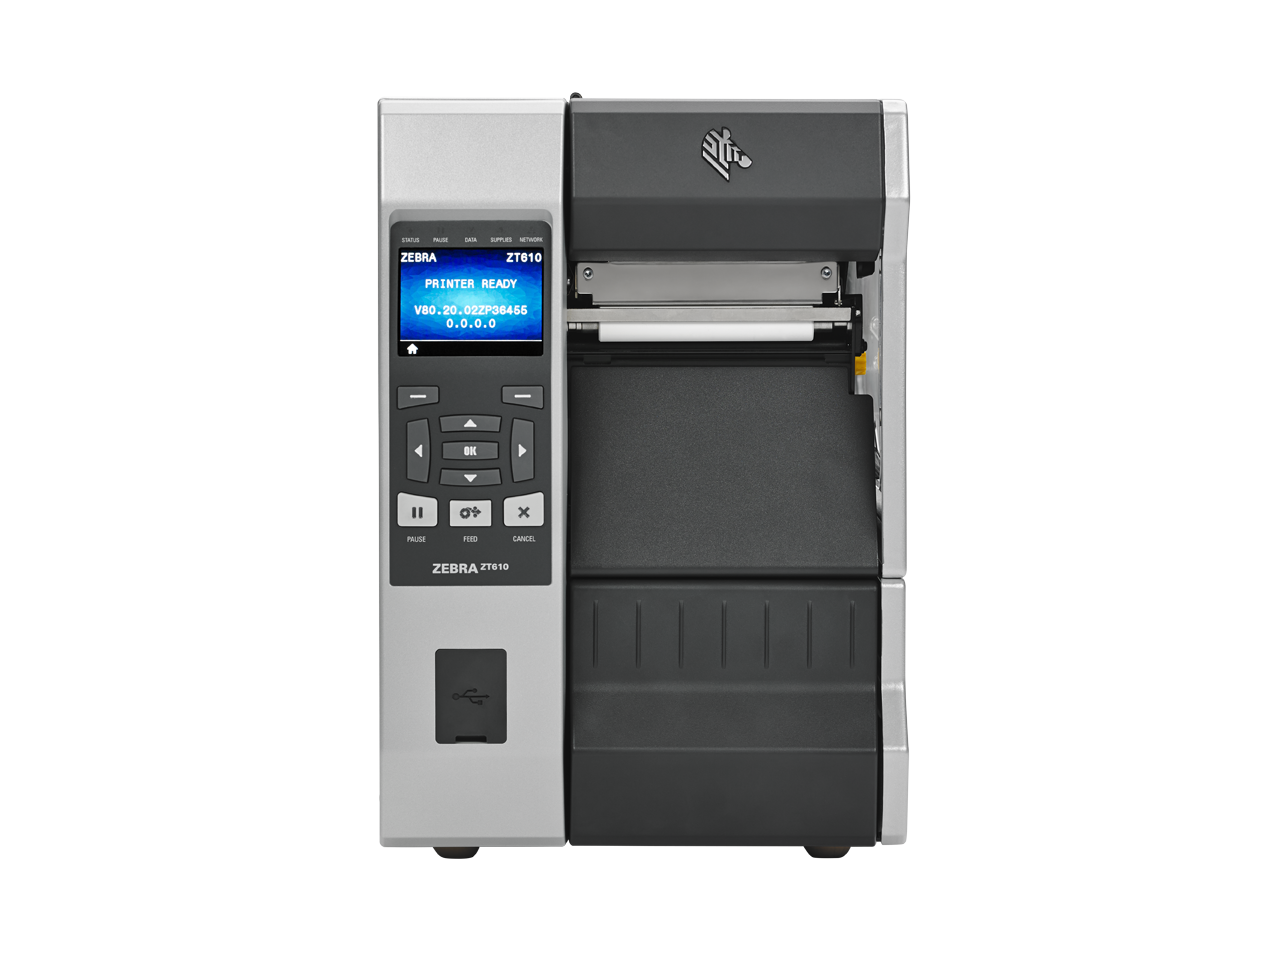 imprimante etiquette zebra zt610